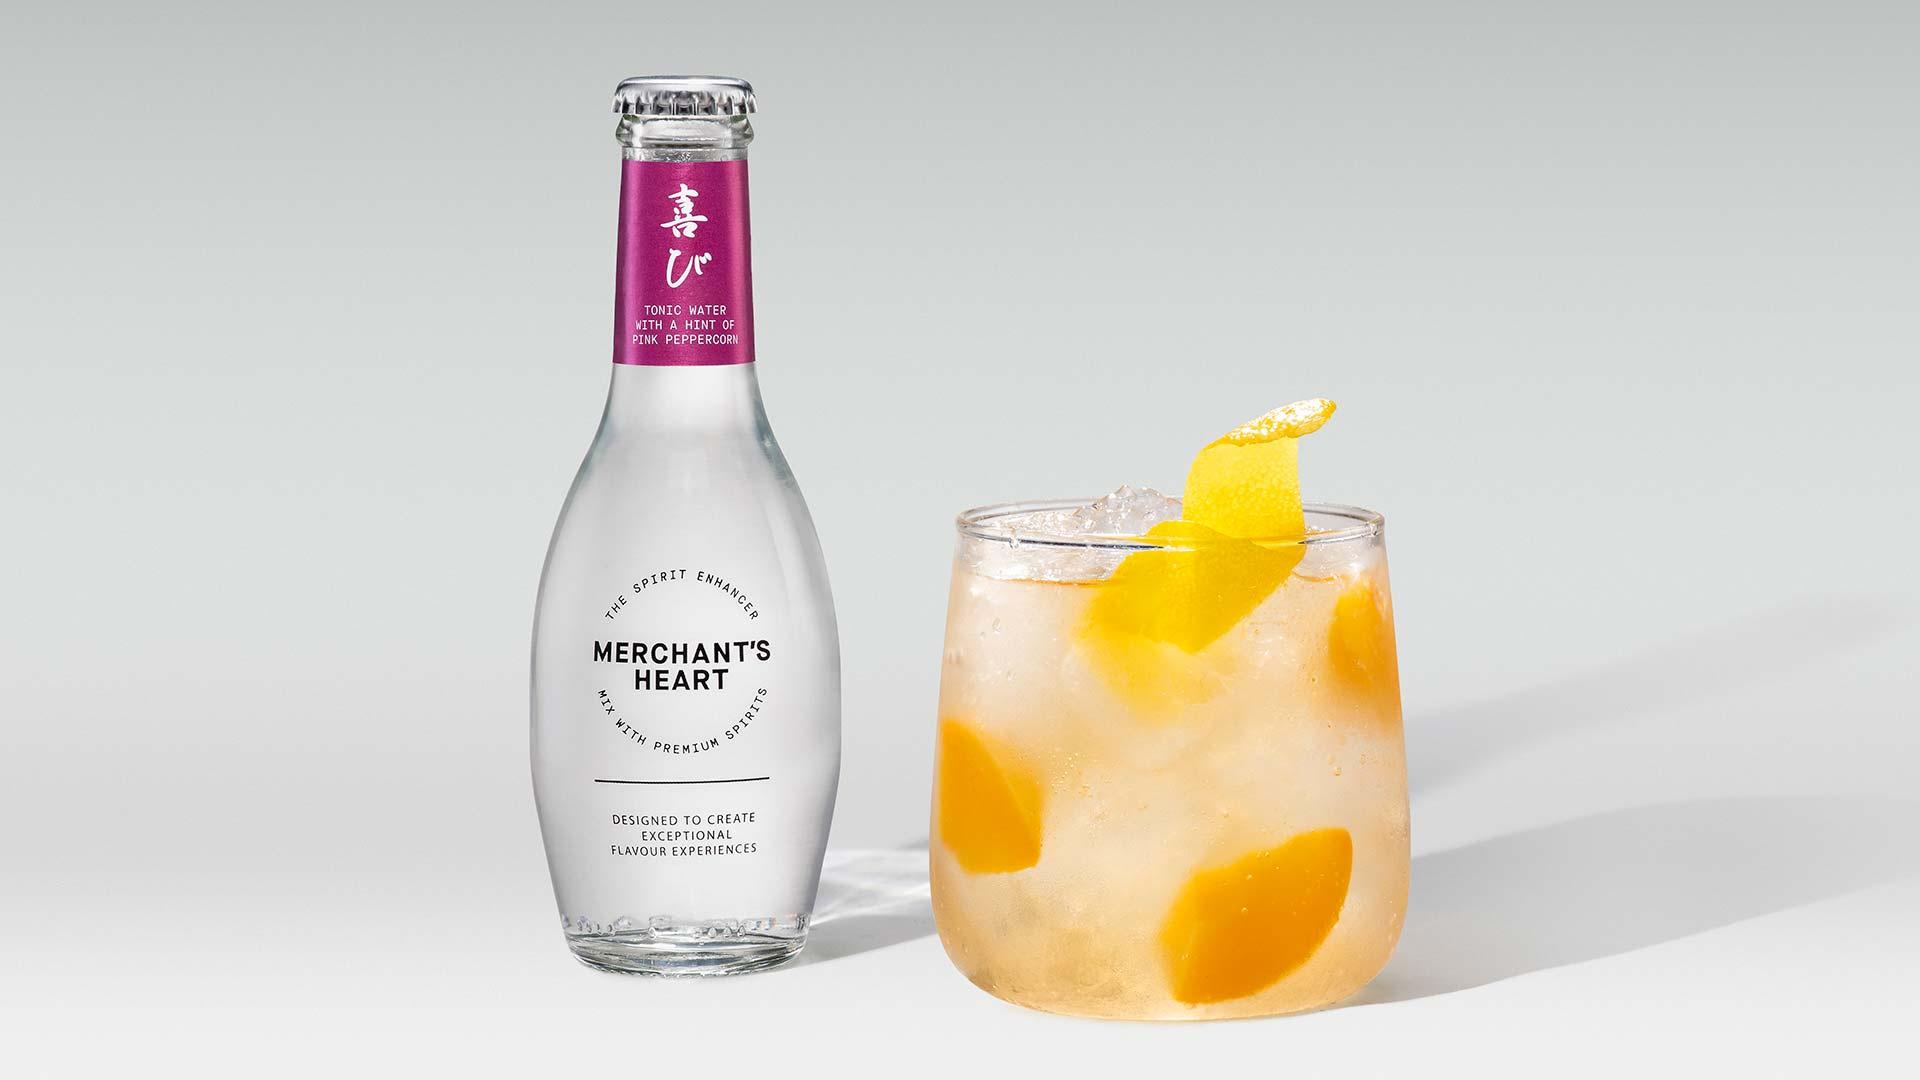 Merchant's Heart's bourbon and pink peppercorn cocktail